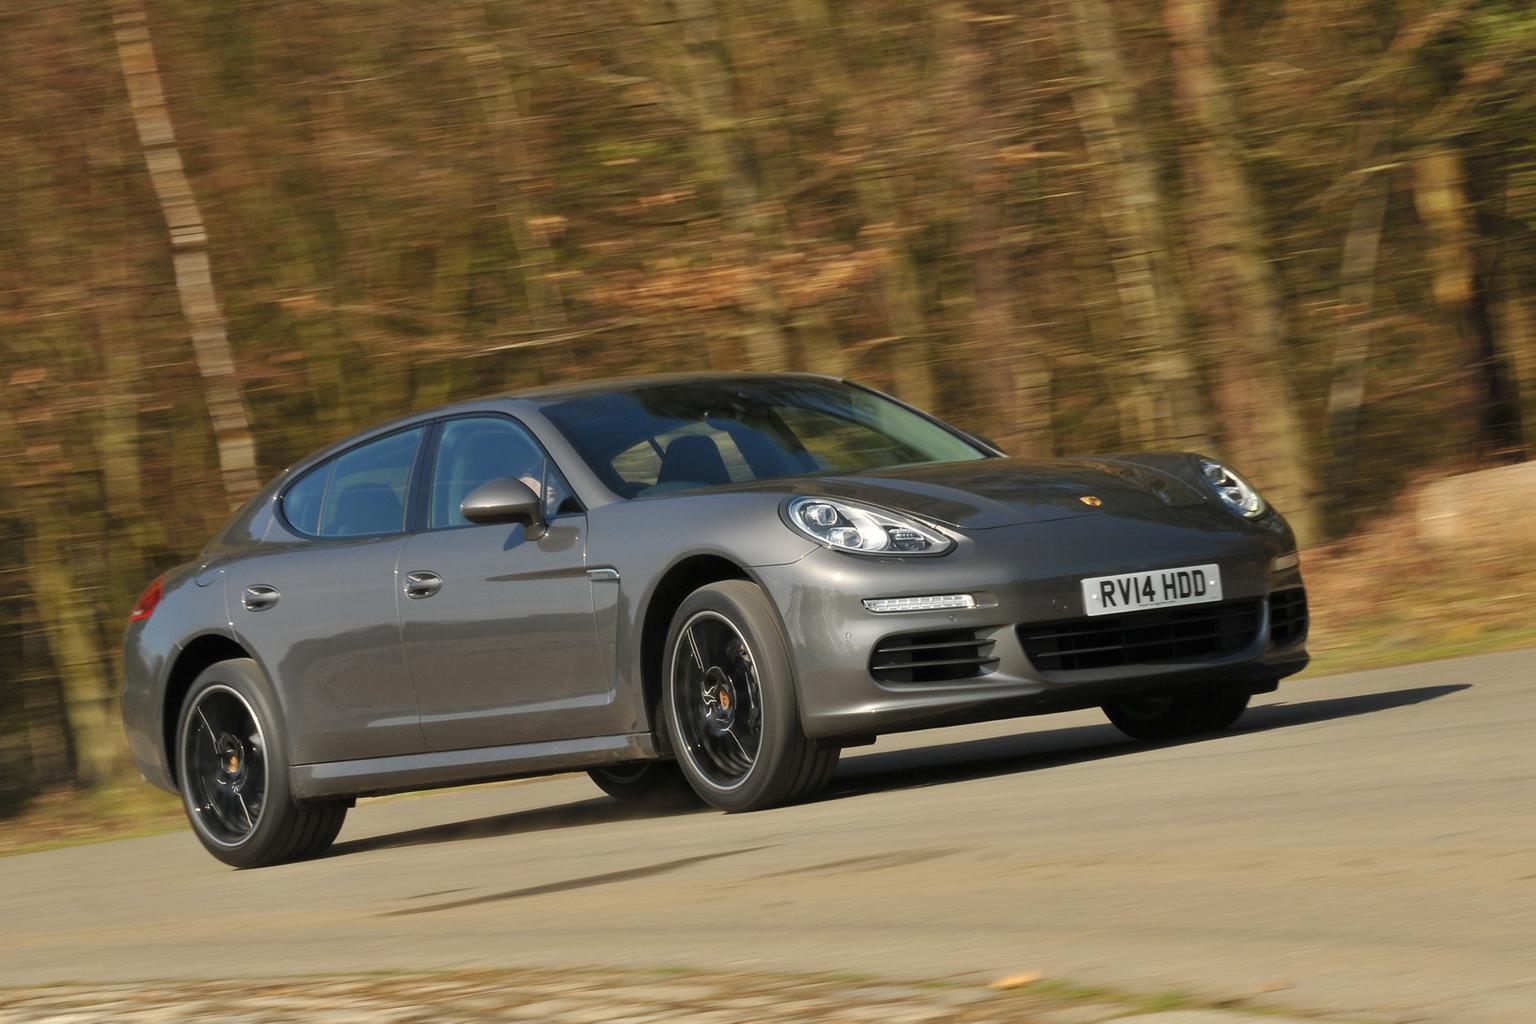 2014 Porsche Panamera Diesel review